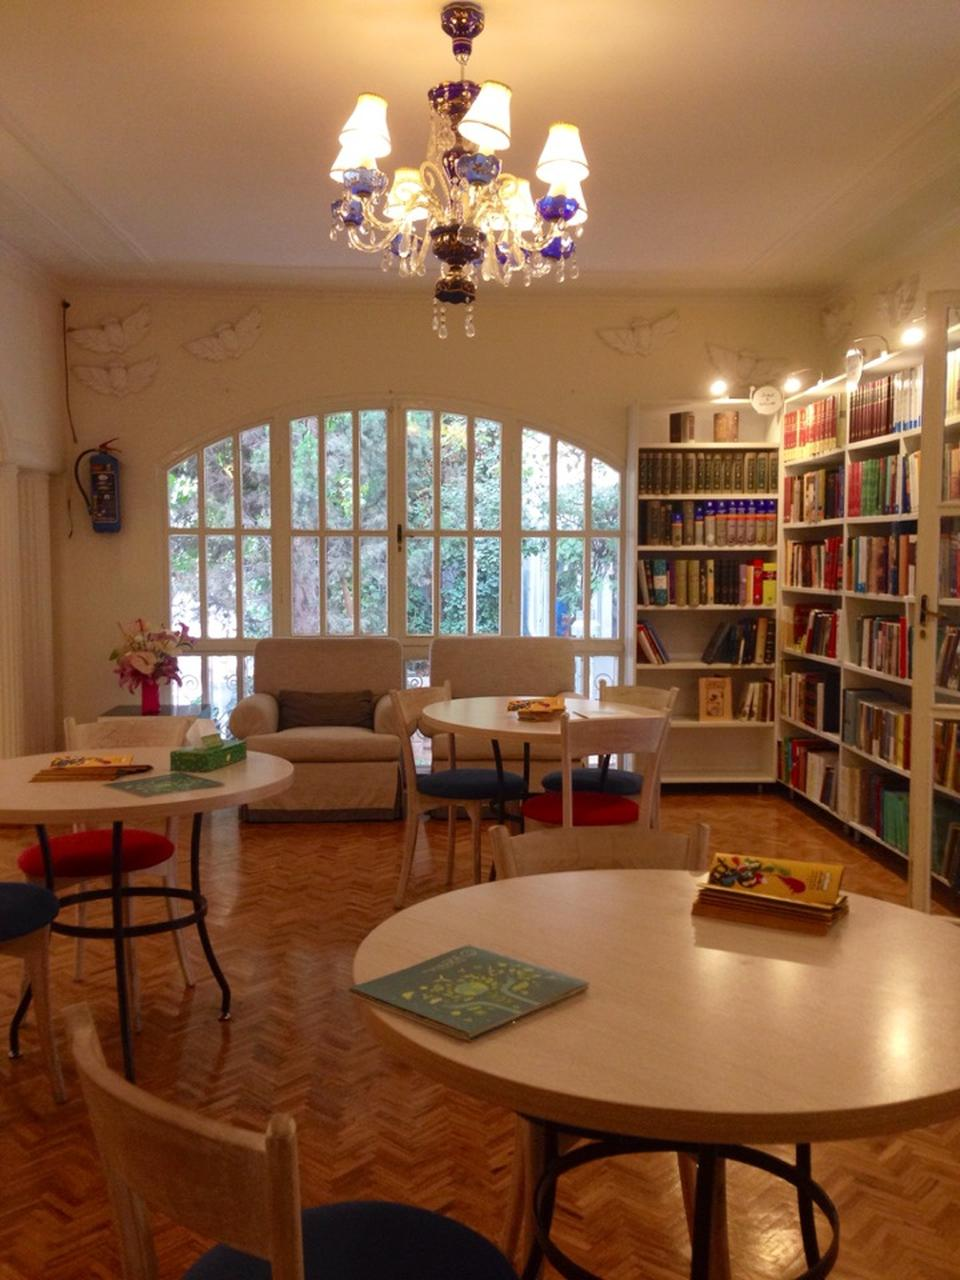 کافه کتاب شهر کتاب فرشته cafe book city fereshteh 5